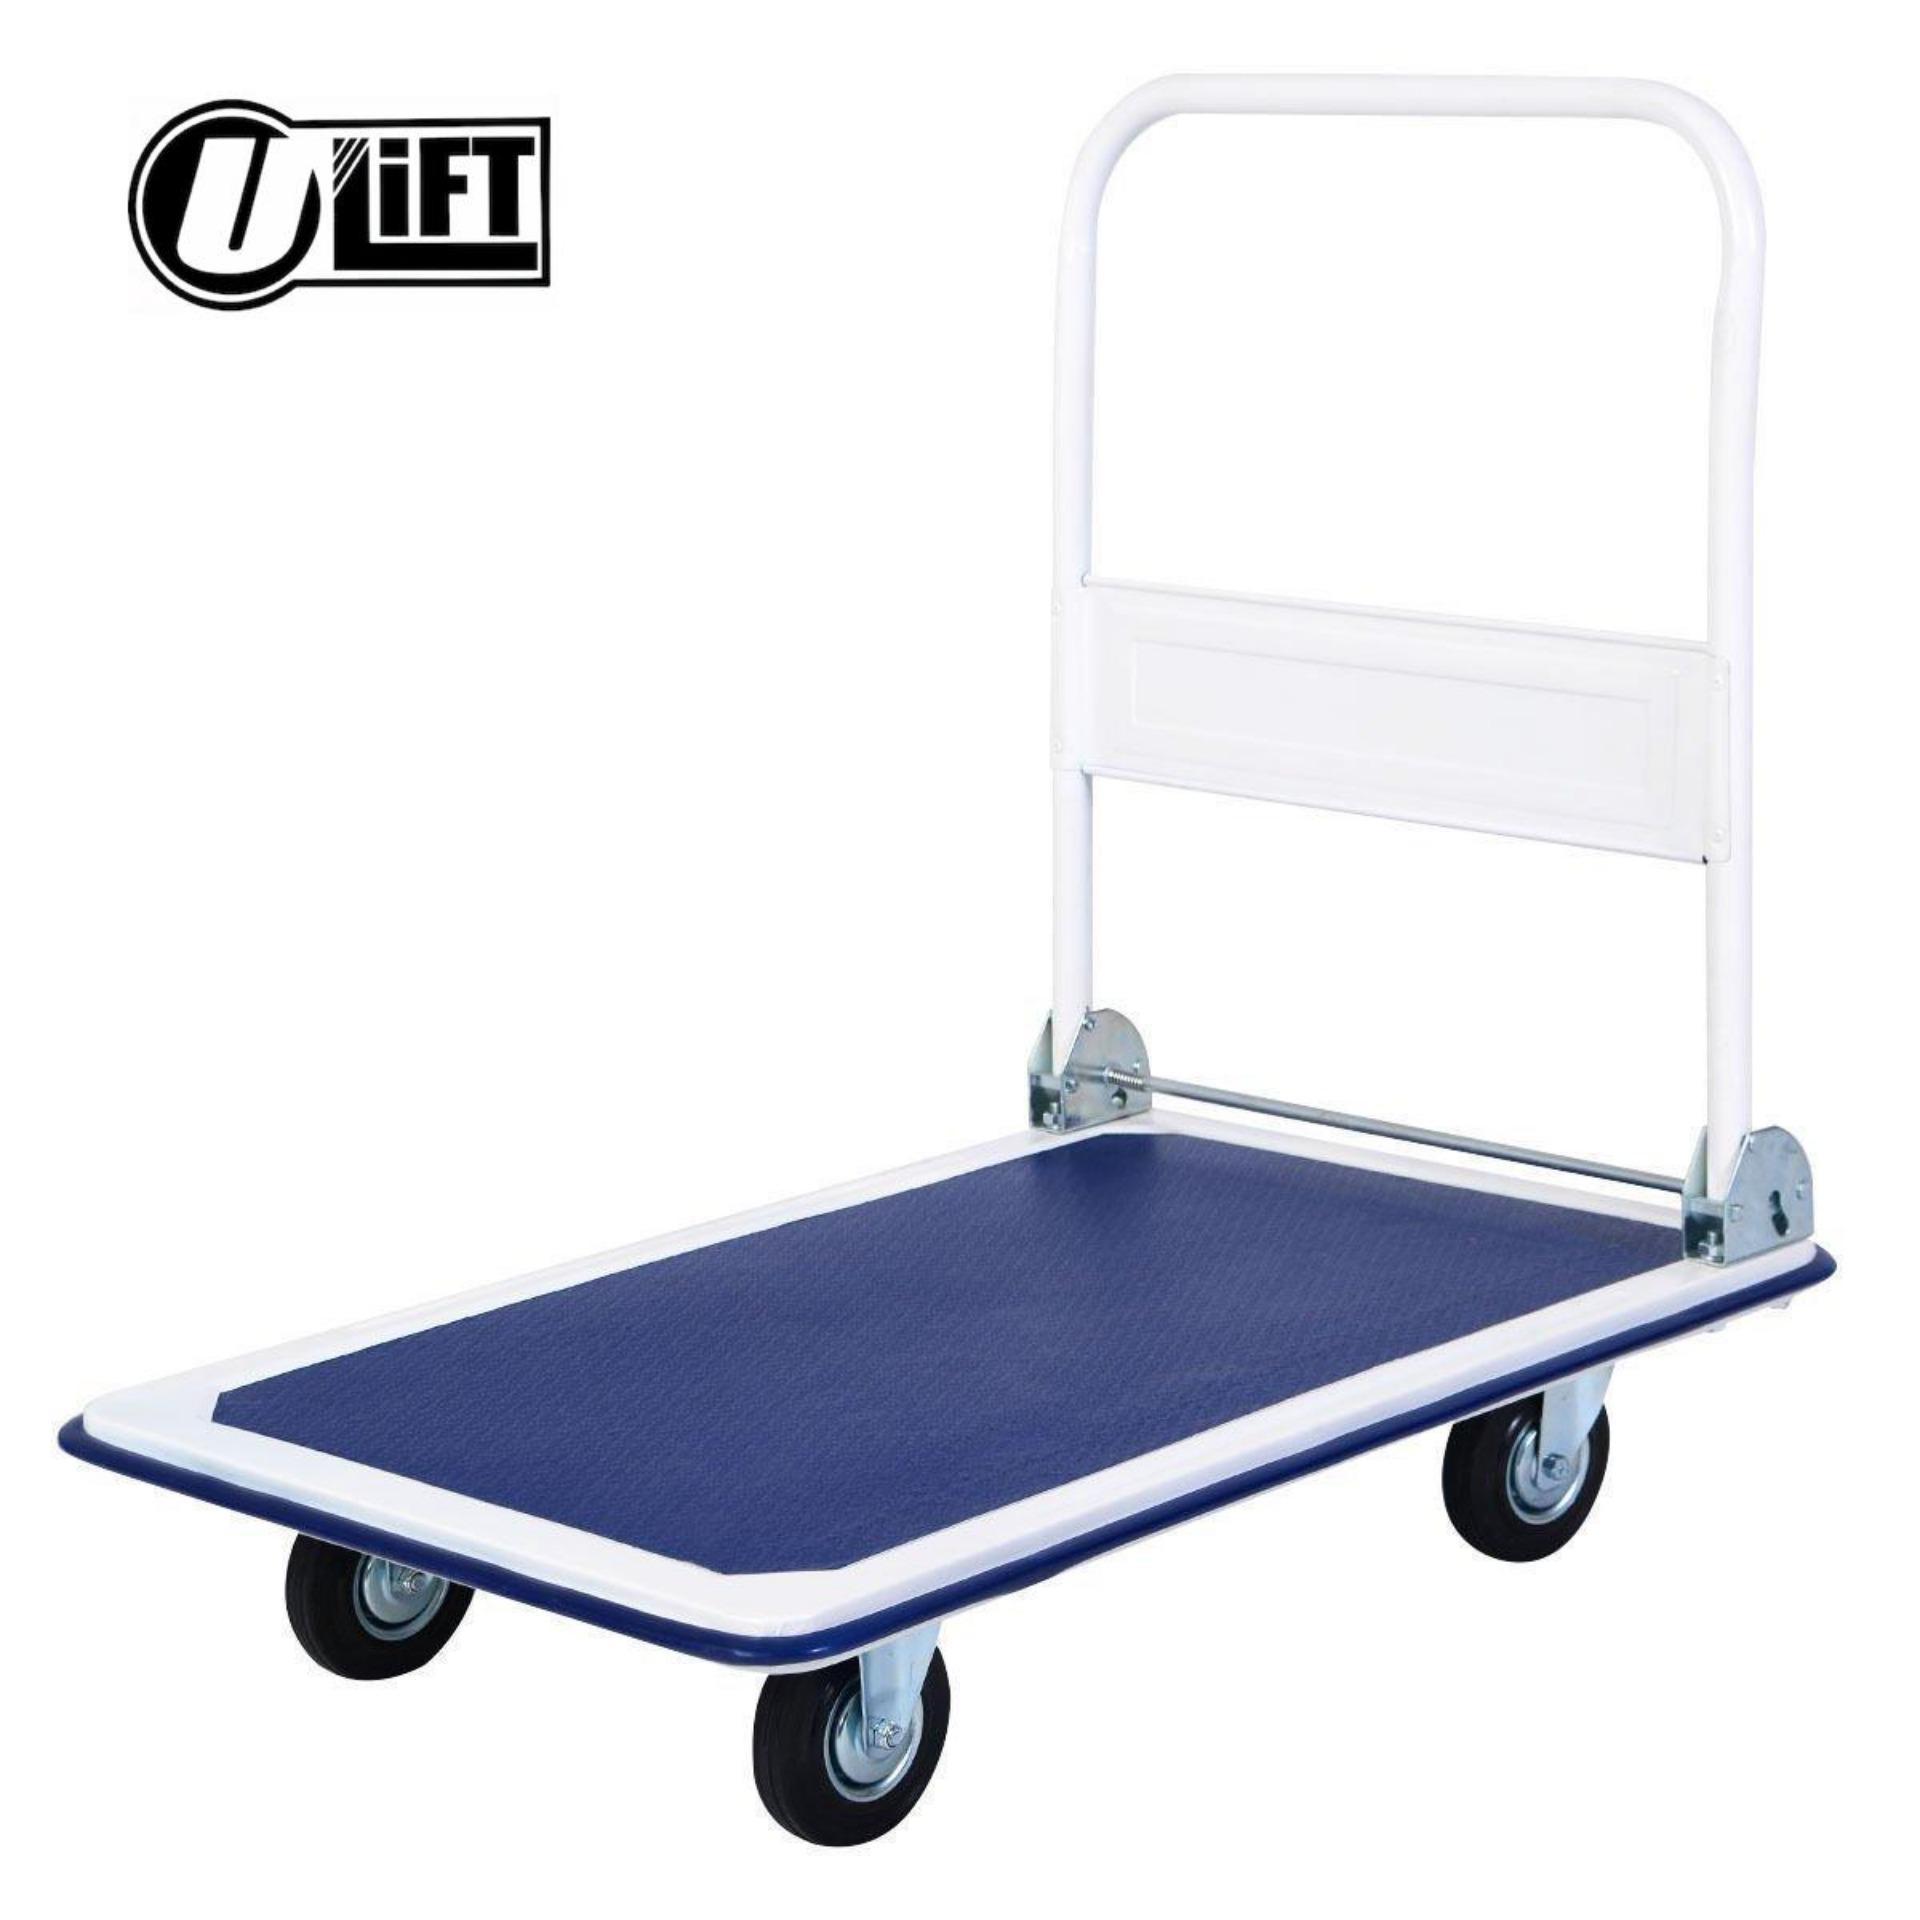 U-Lift™ Hand Truck Trolley Folding Push Cart 300kg By Giame Manila.